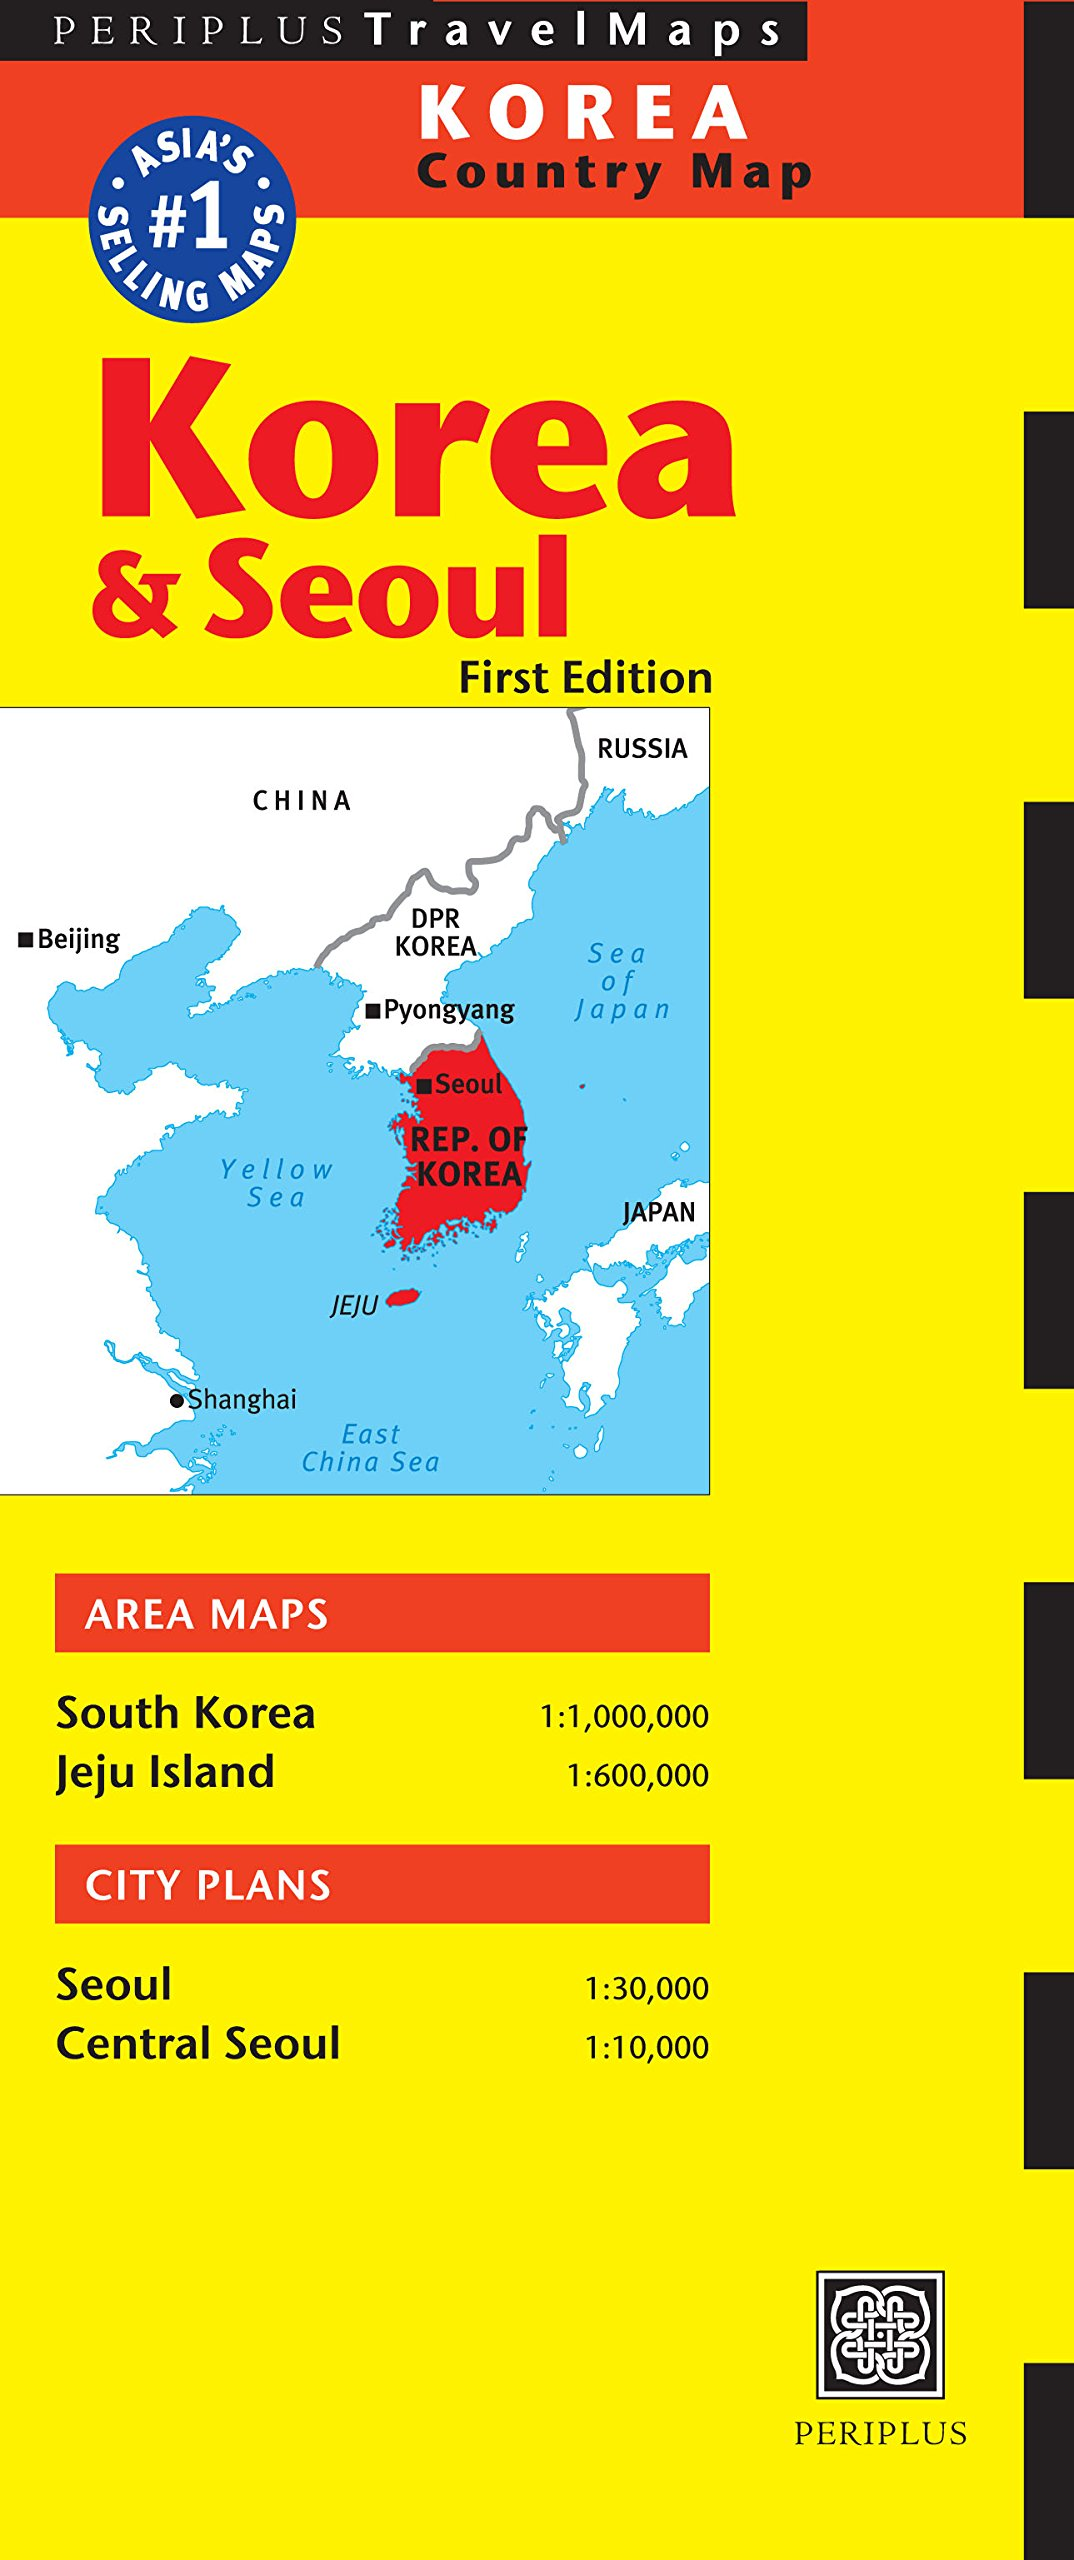 Print Seoul Subway Map 2017.Korea Seoul Travel Map Second Edition Periplus Travel Maps